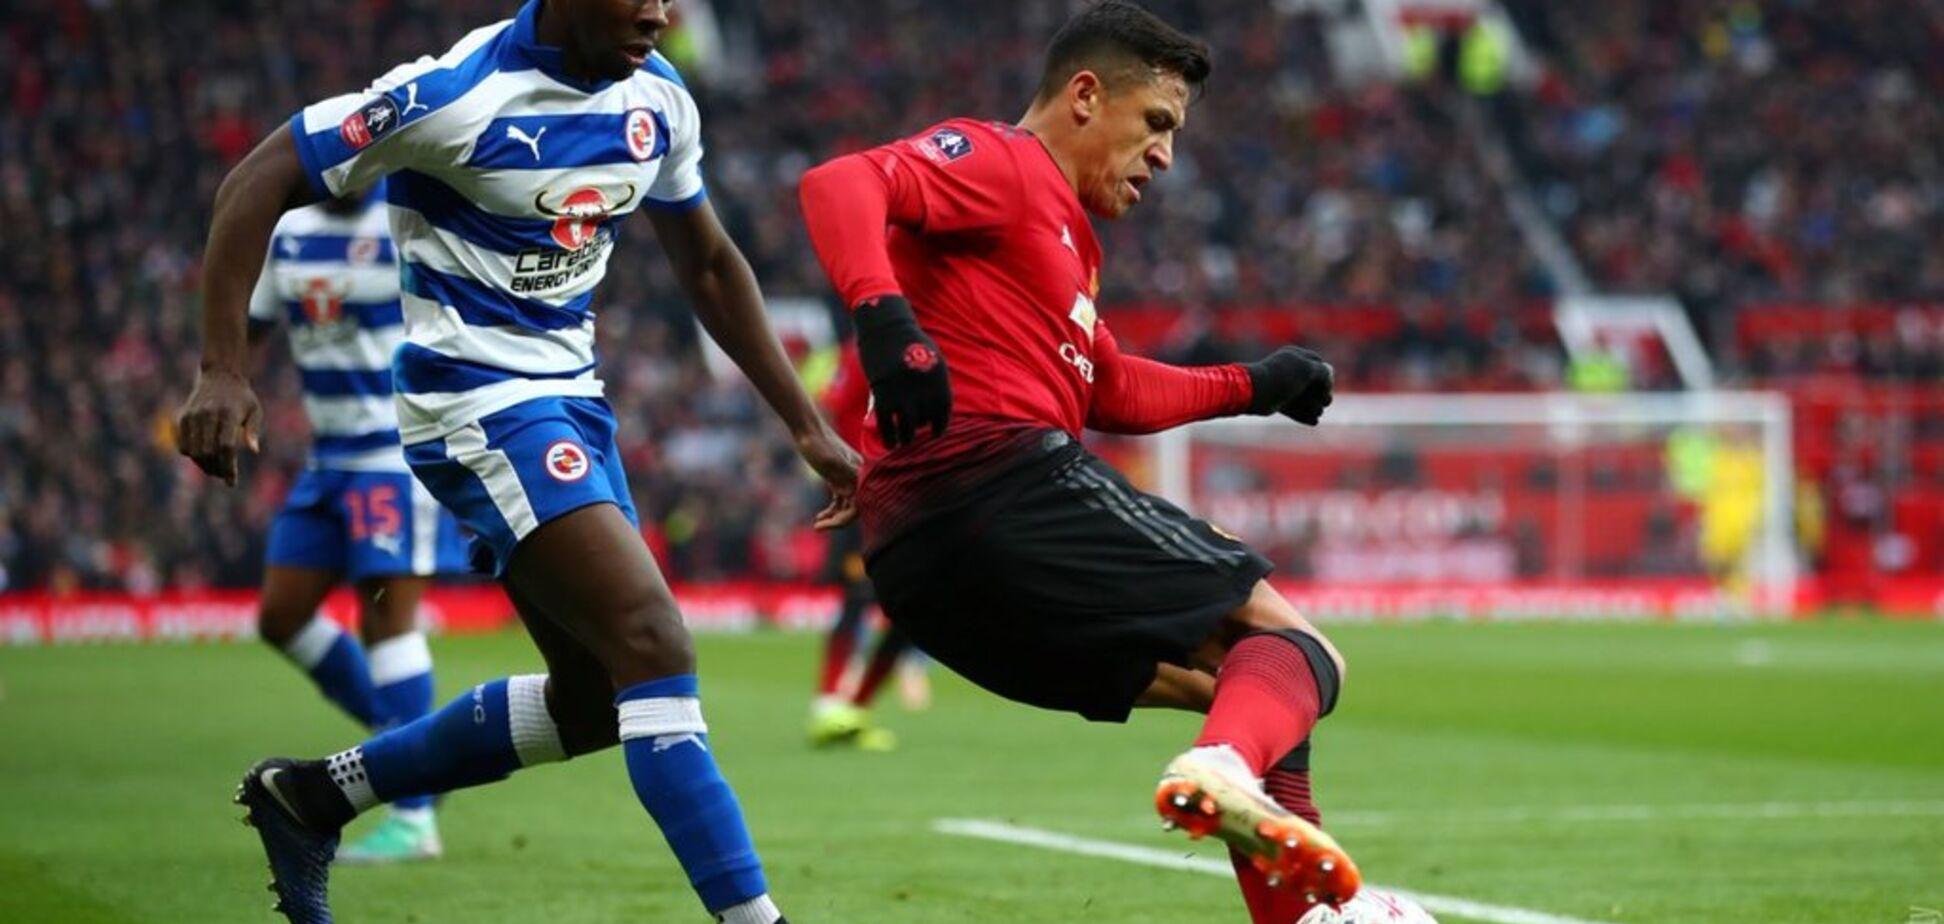 Знаменитый футболист попал в курьезную ситуацию на матче Кубка Англии